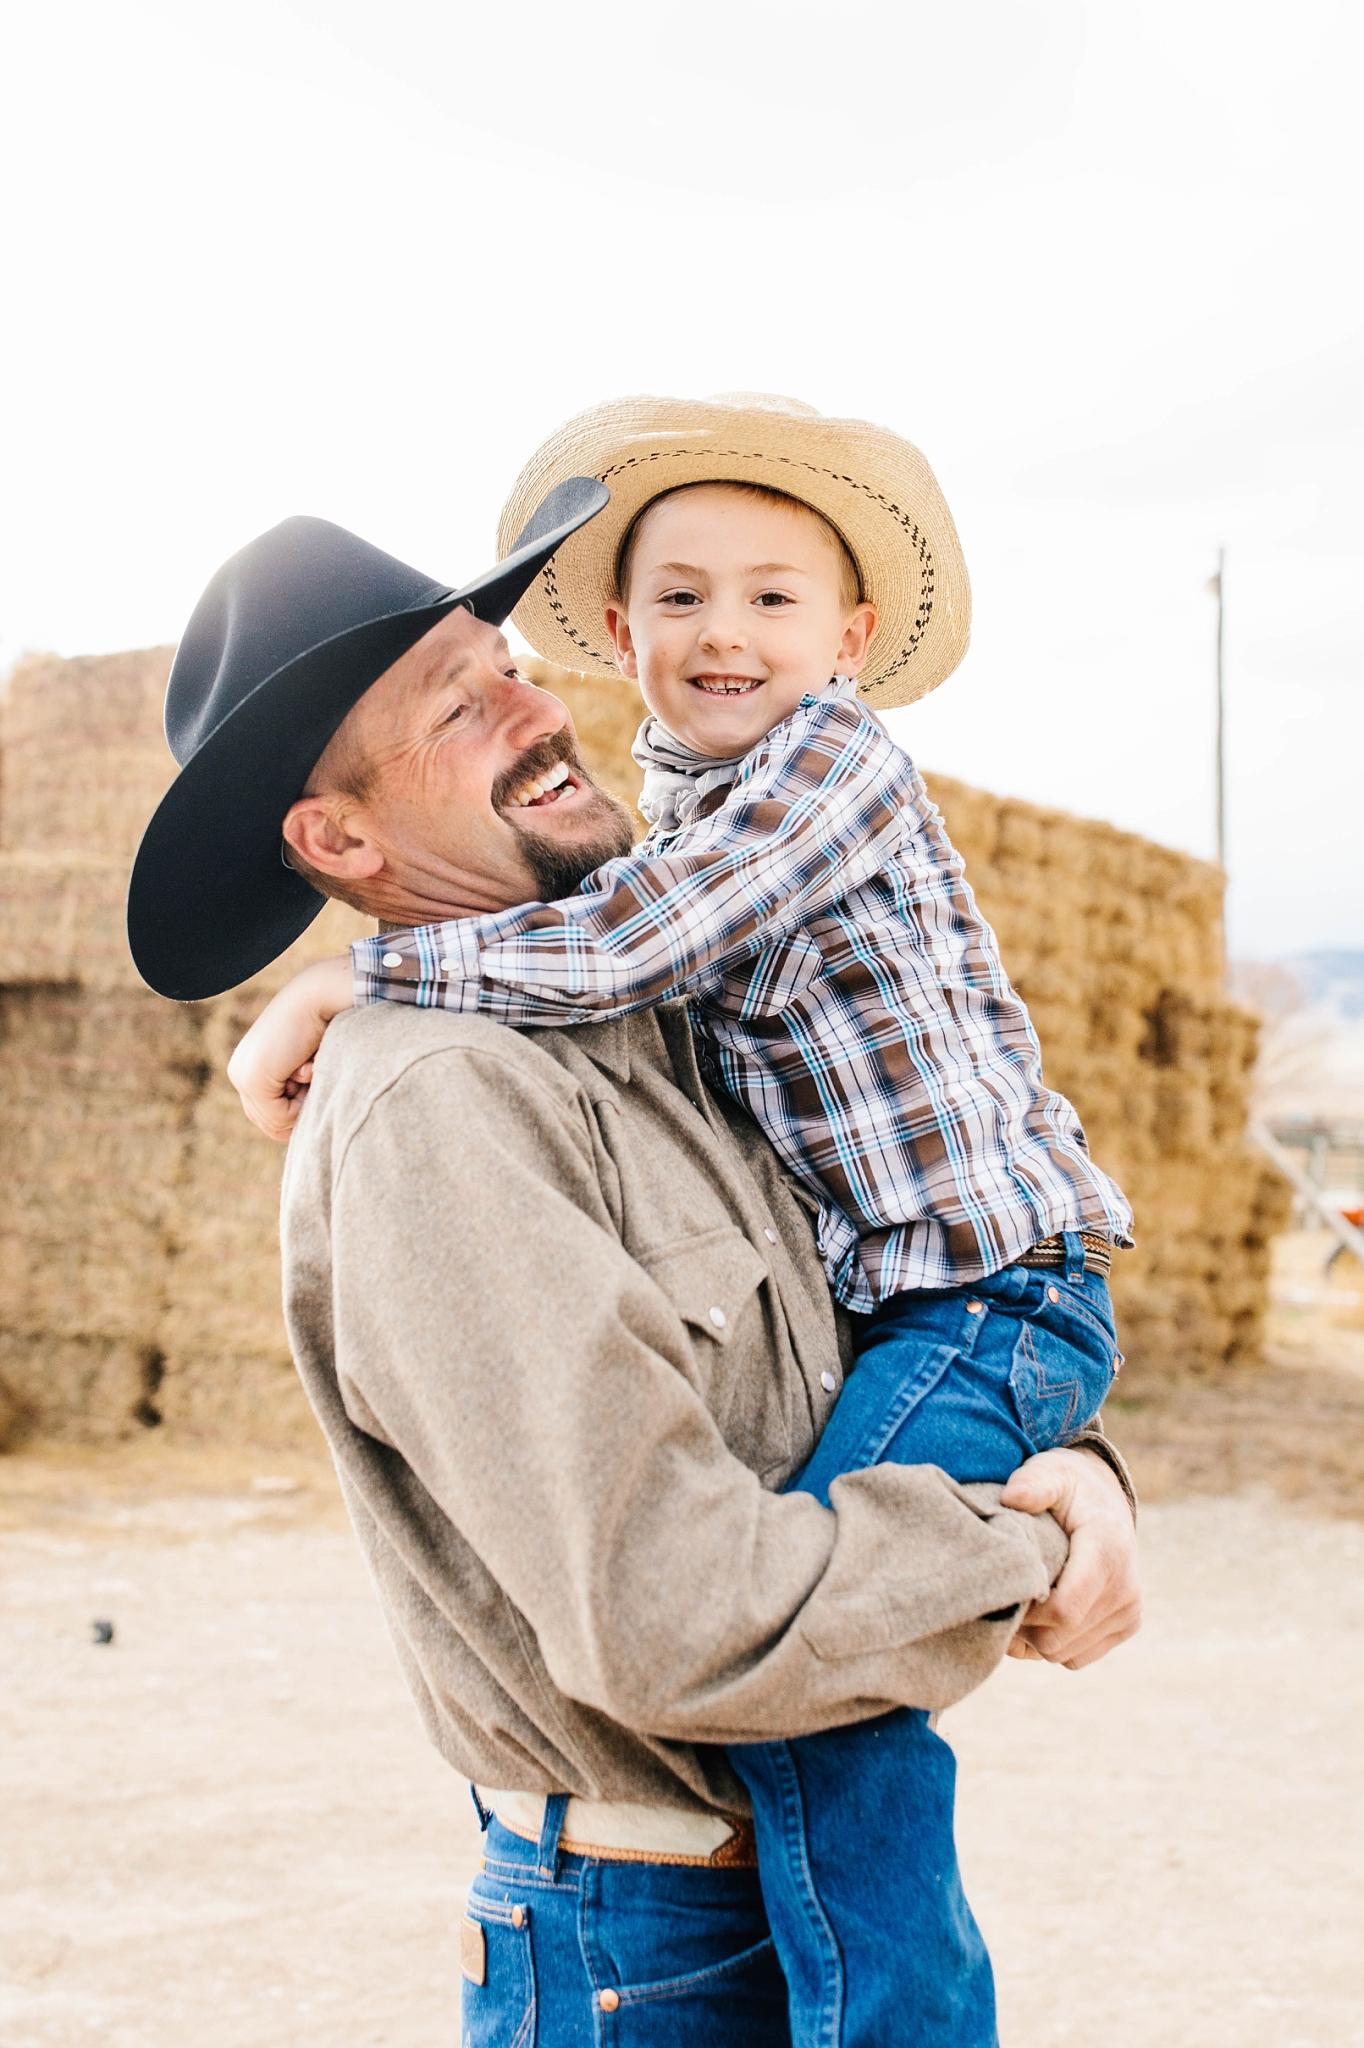 Lister-67_Lizzie-B-Imagery-Utah-Family-Photographer-Lifestyle-Photography-Salt-Lake-City-Park-City-Utah-County-Farm-Family-Session.jpg